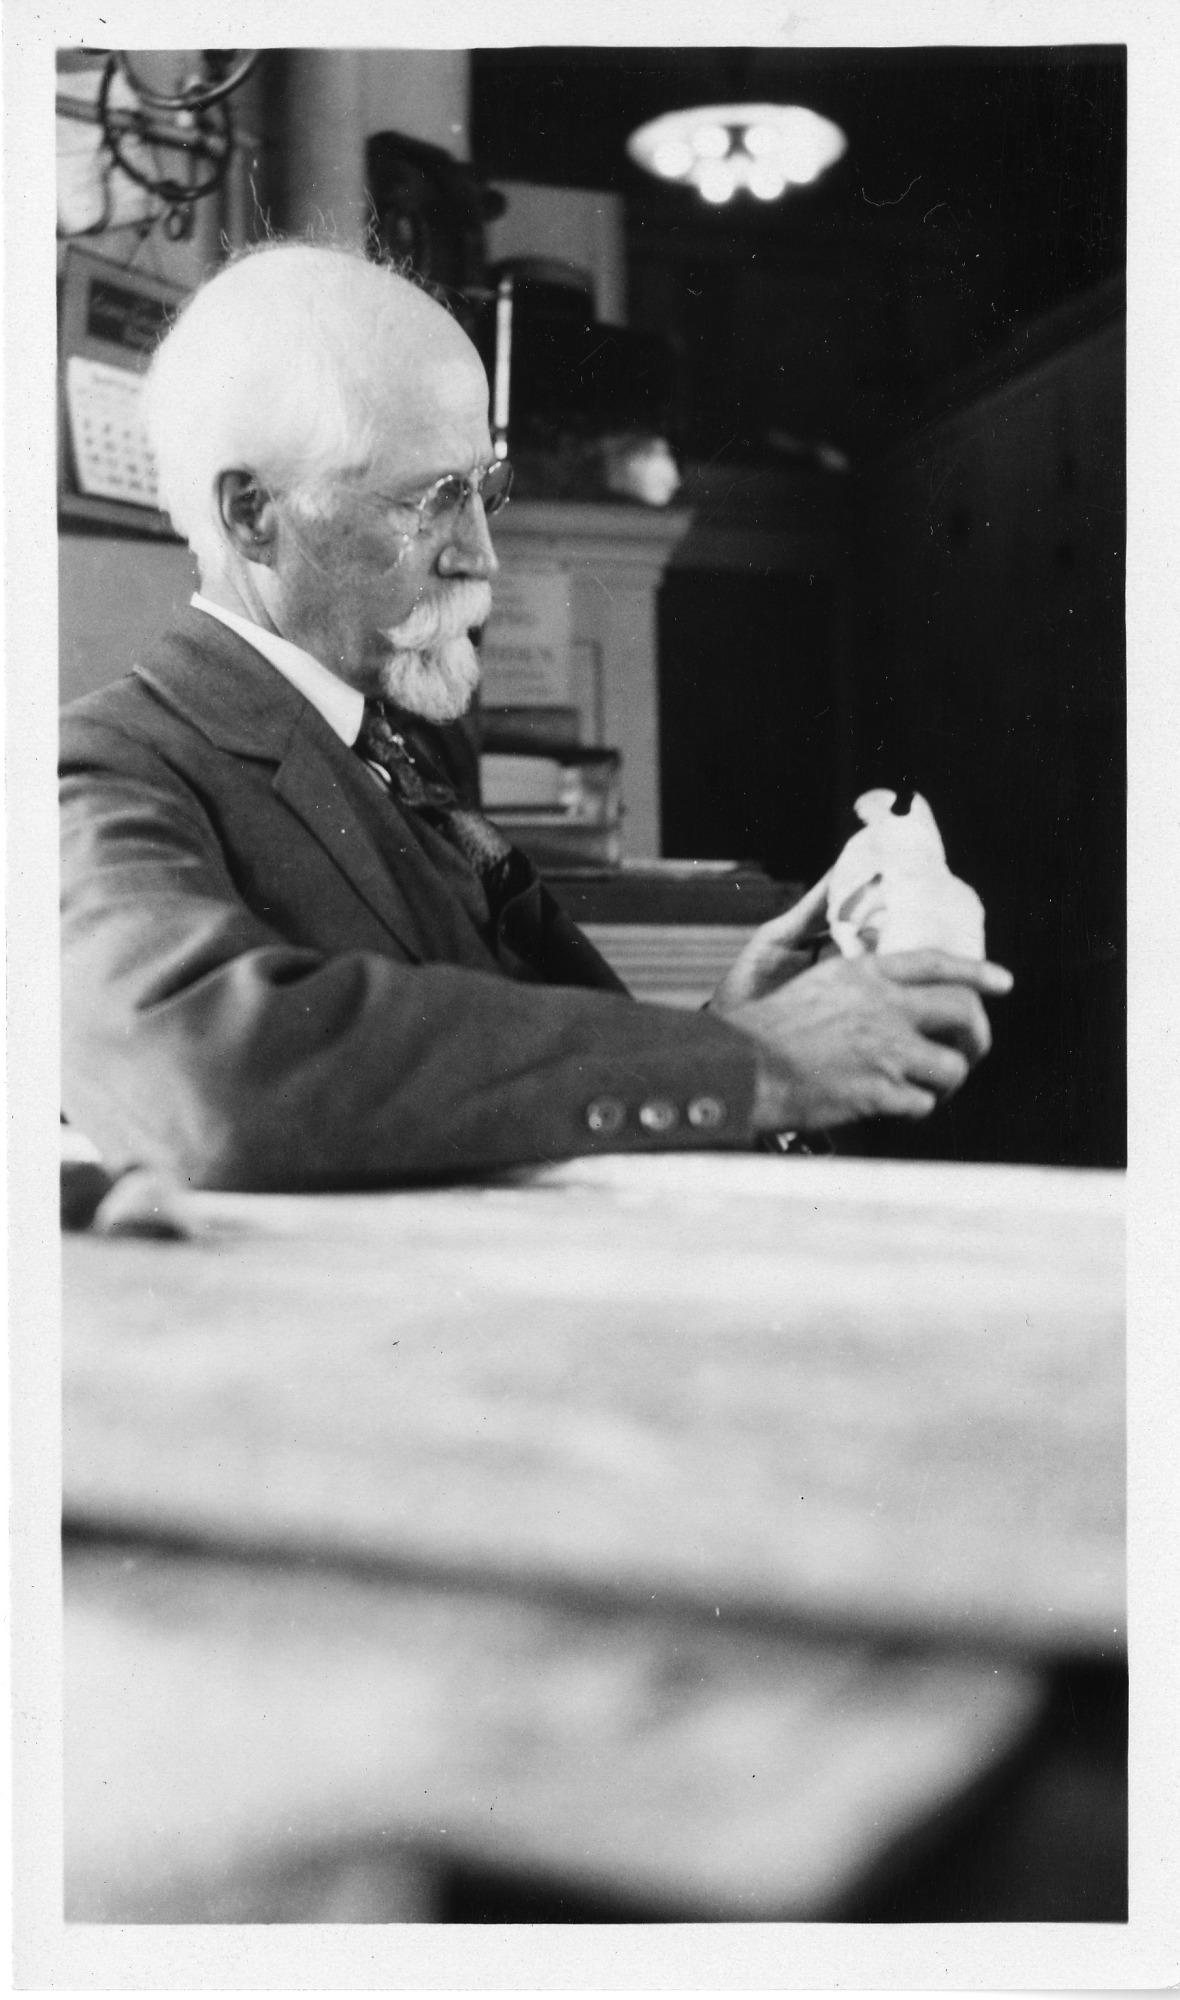 Samuel Harmsted Chubb (1863-1949)